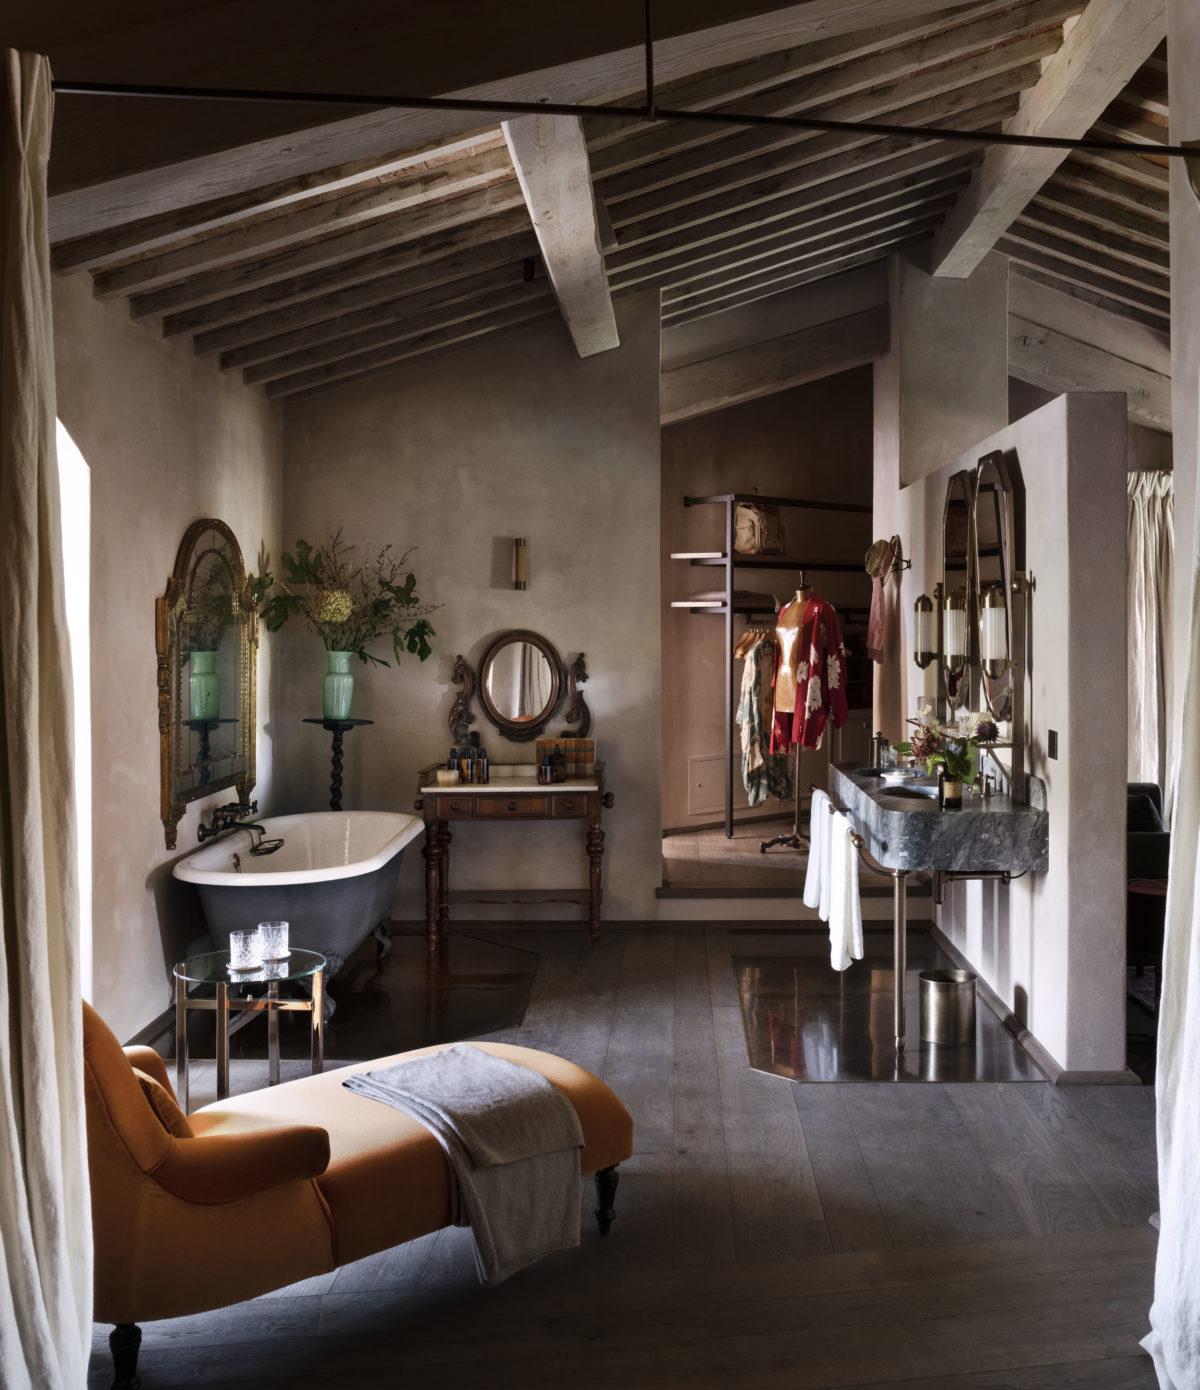 20_Hotel Castello di Reschio - Suite